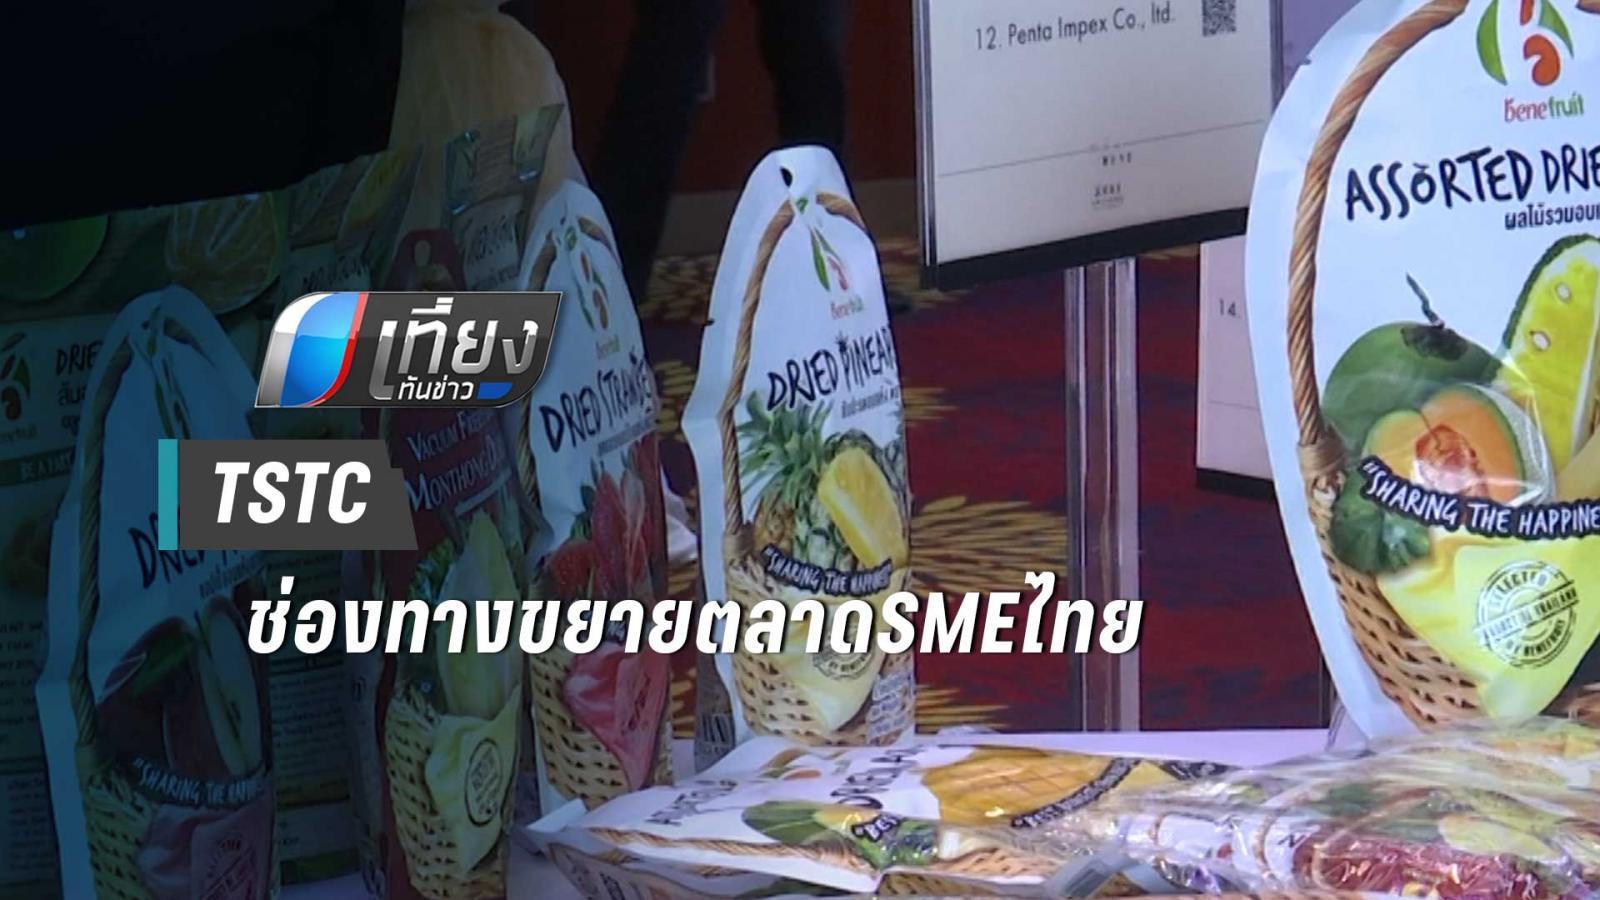 TSTC ช่องทางขยายตลาดเอสเอ็มอีไทย ในประเทศจีน